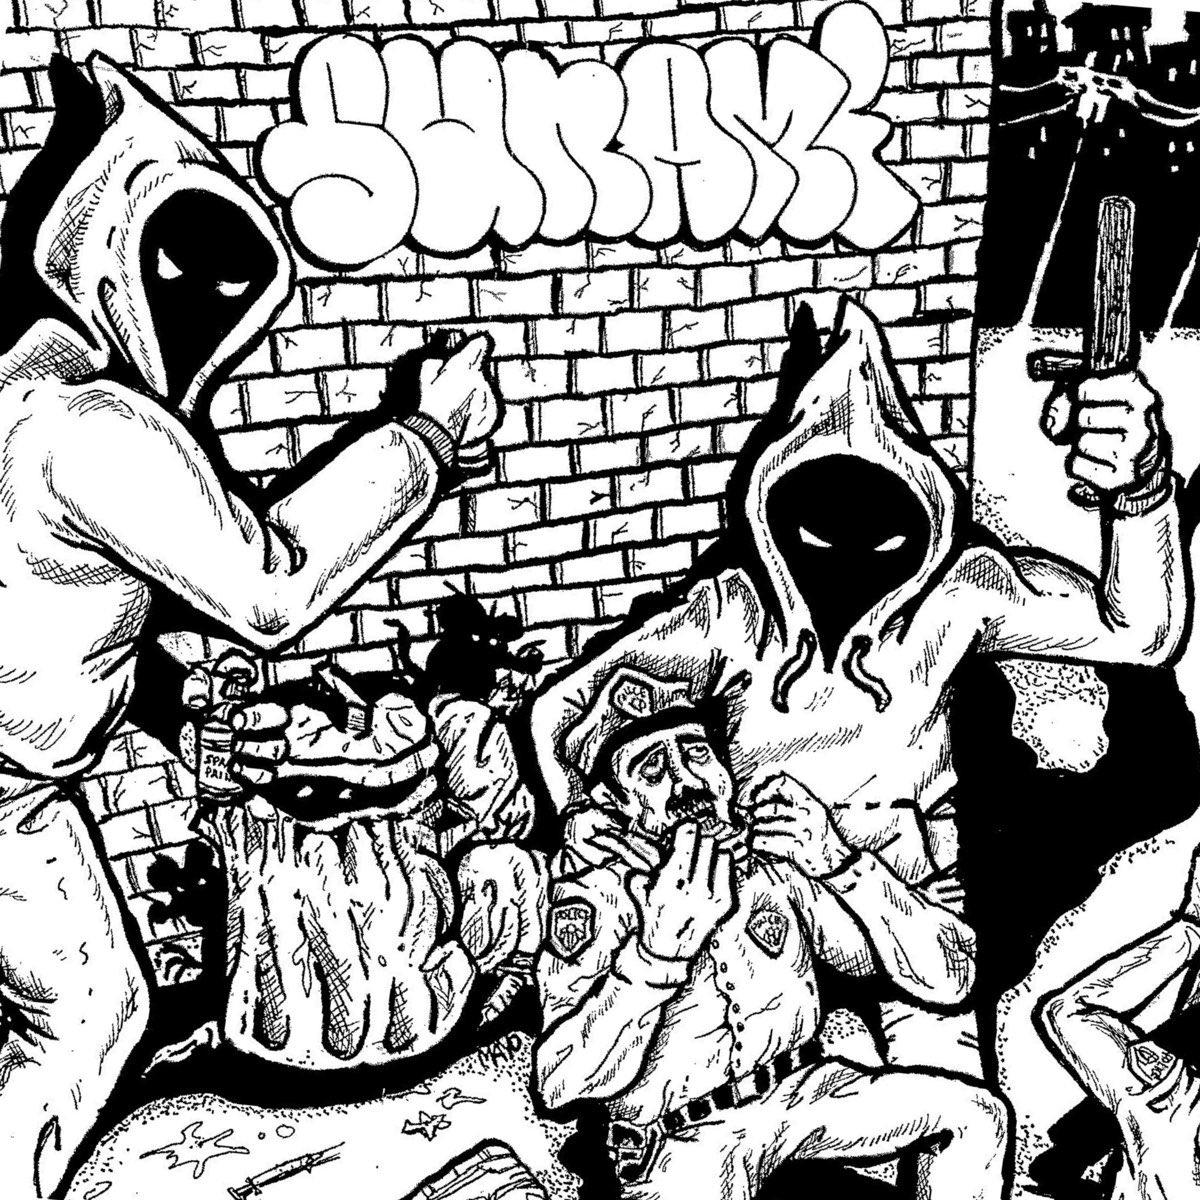 @SUNAMI408 artwork speaks volumes today. <br>http://pic.twitter.com/8D9eVR2VJy